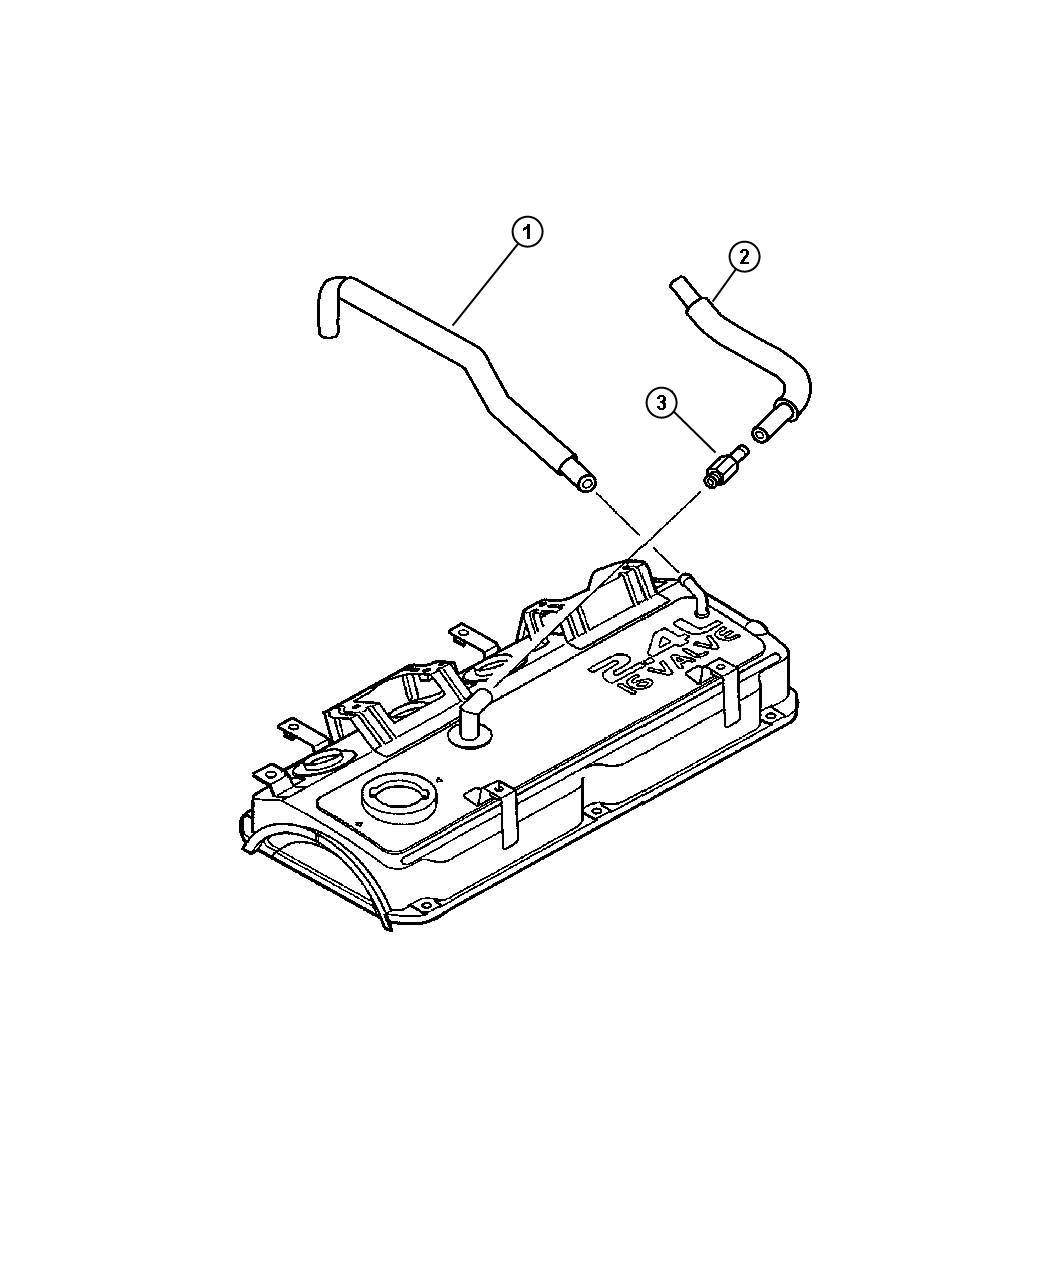 Chrysler Sebring Valve Pcv Ventilation Crankcase